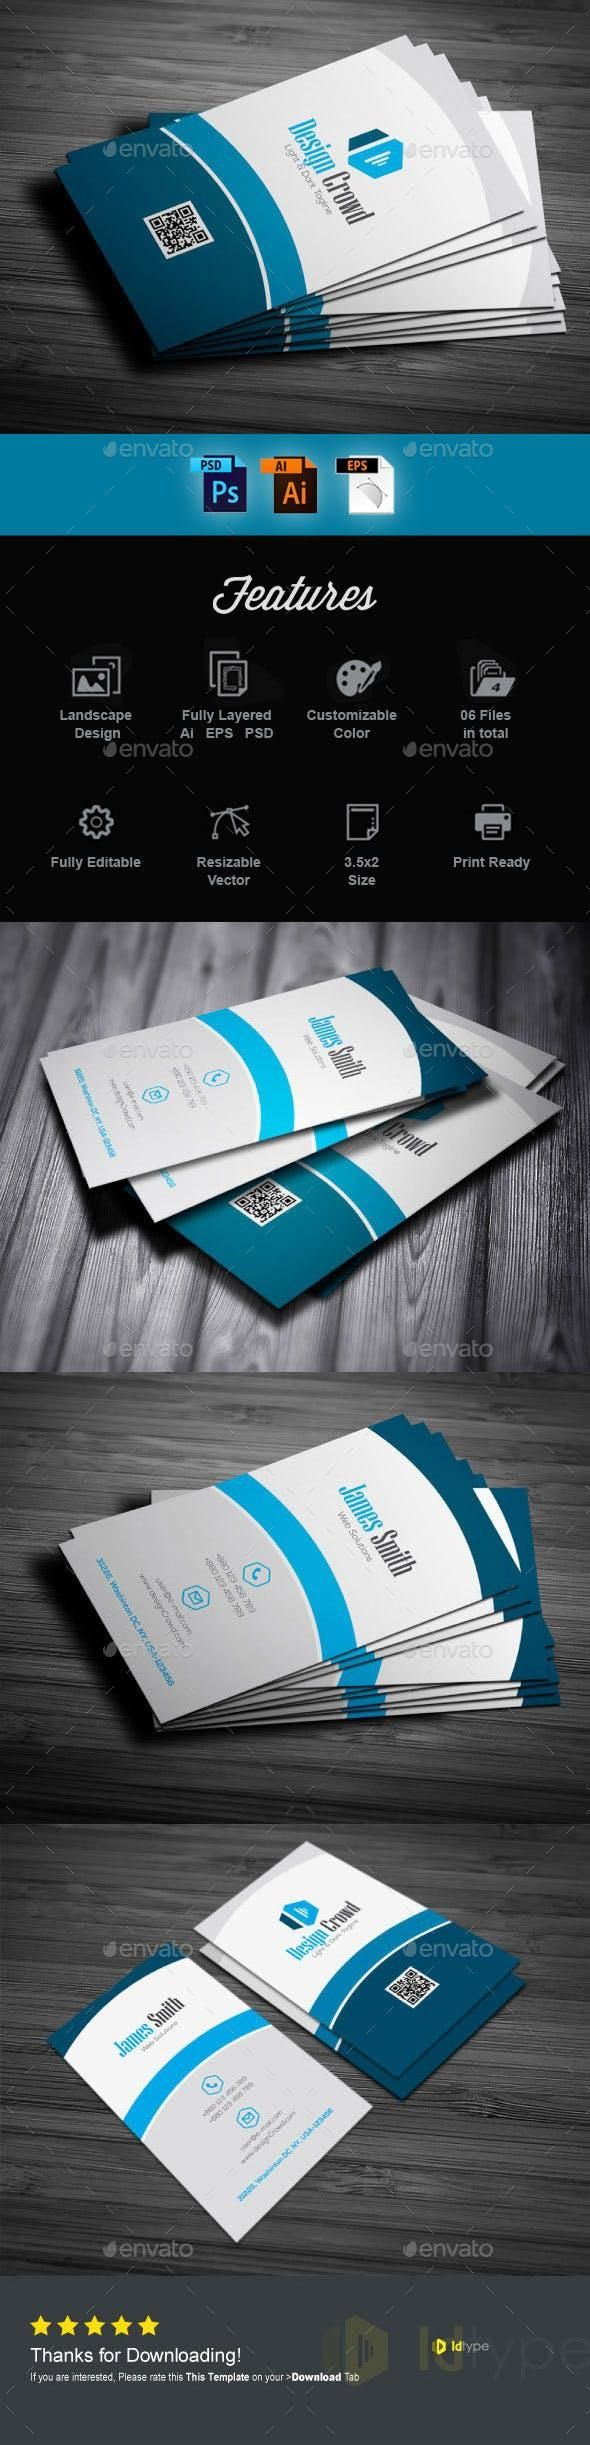 Business Card Carddesign Set Design Designcollections Businesscard Print Busi Business Card Template Design Cool Business Cards Business Card Minimalist